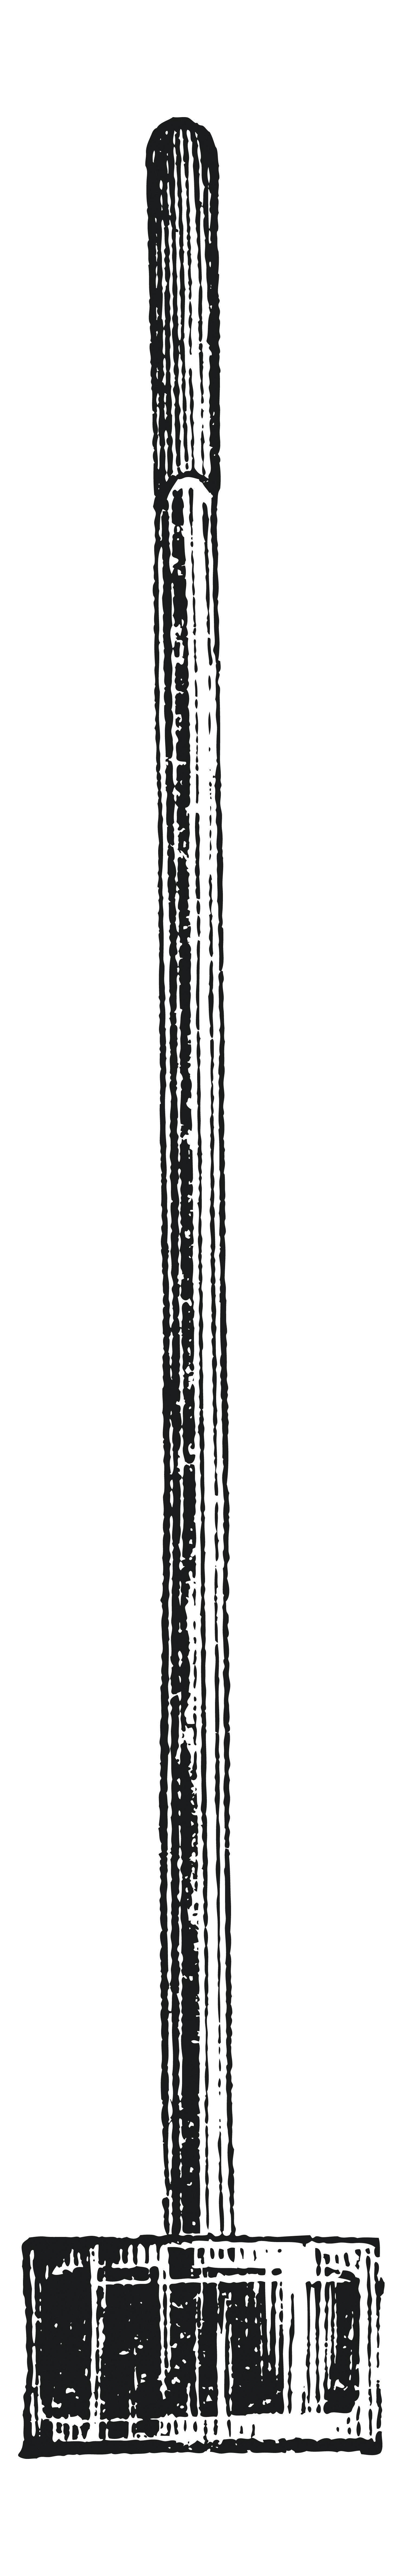 Barometre de Torricelli